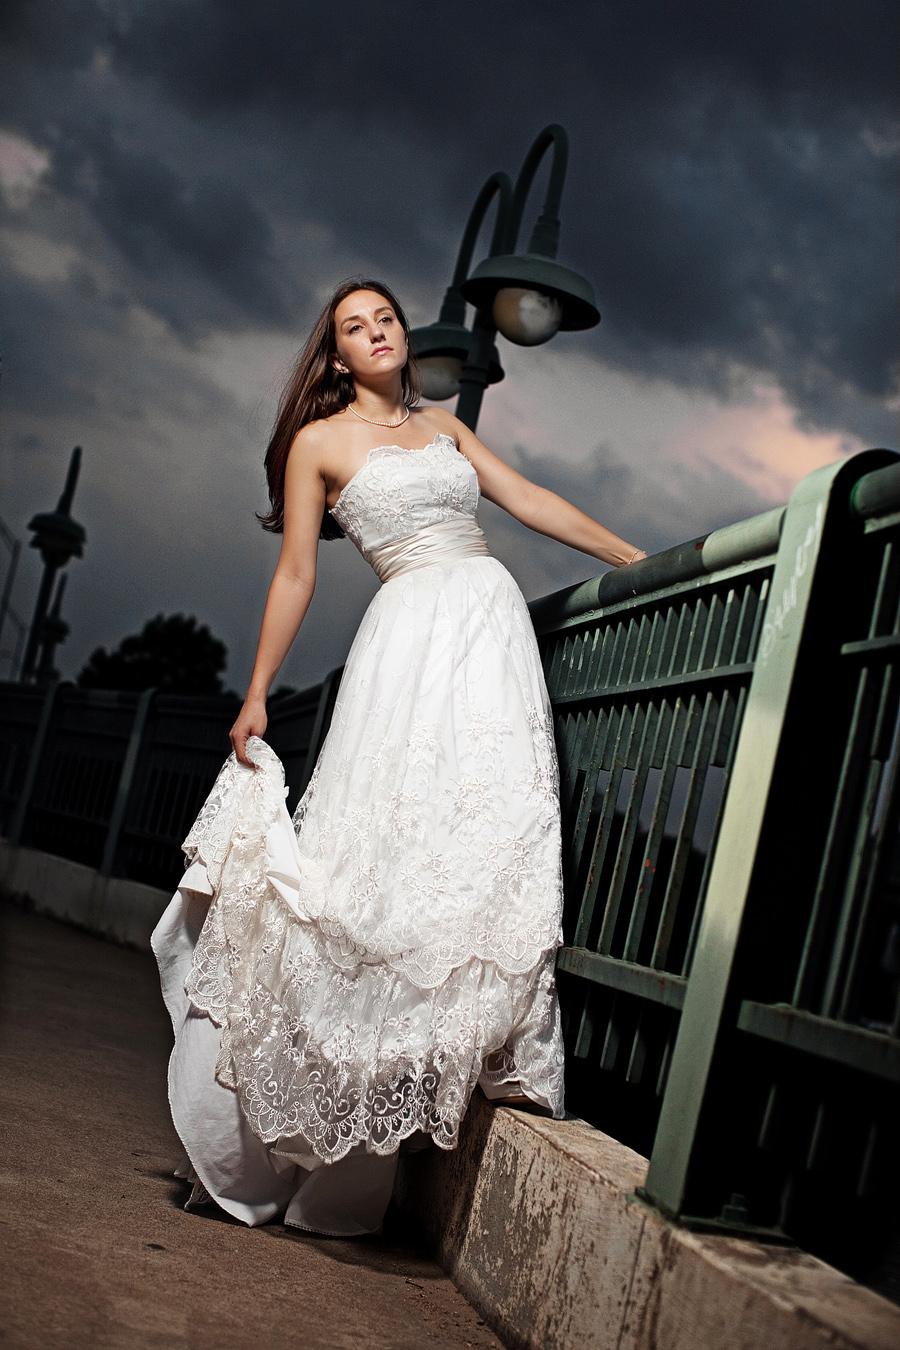 austin texas zilker park bridal portrait